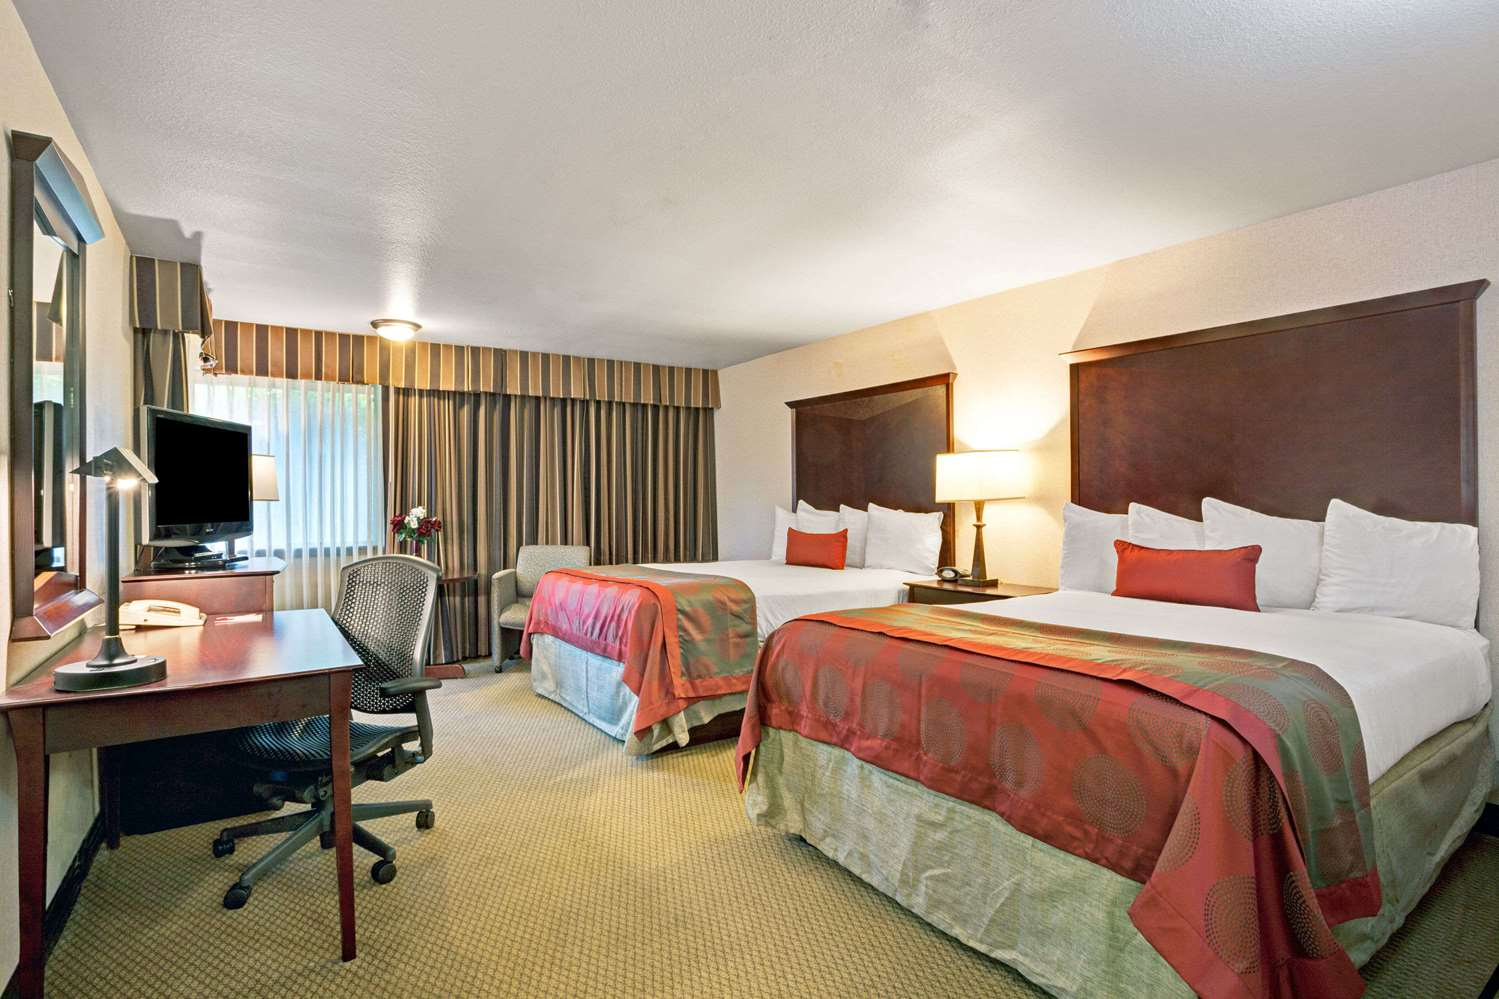 Room - Ramada Inn SeaTacAirport Tukwila